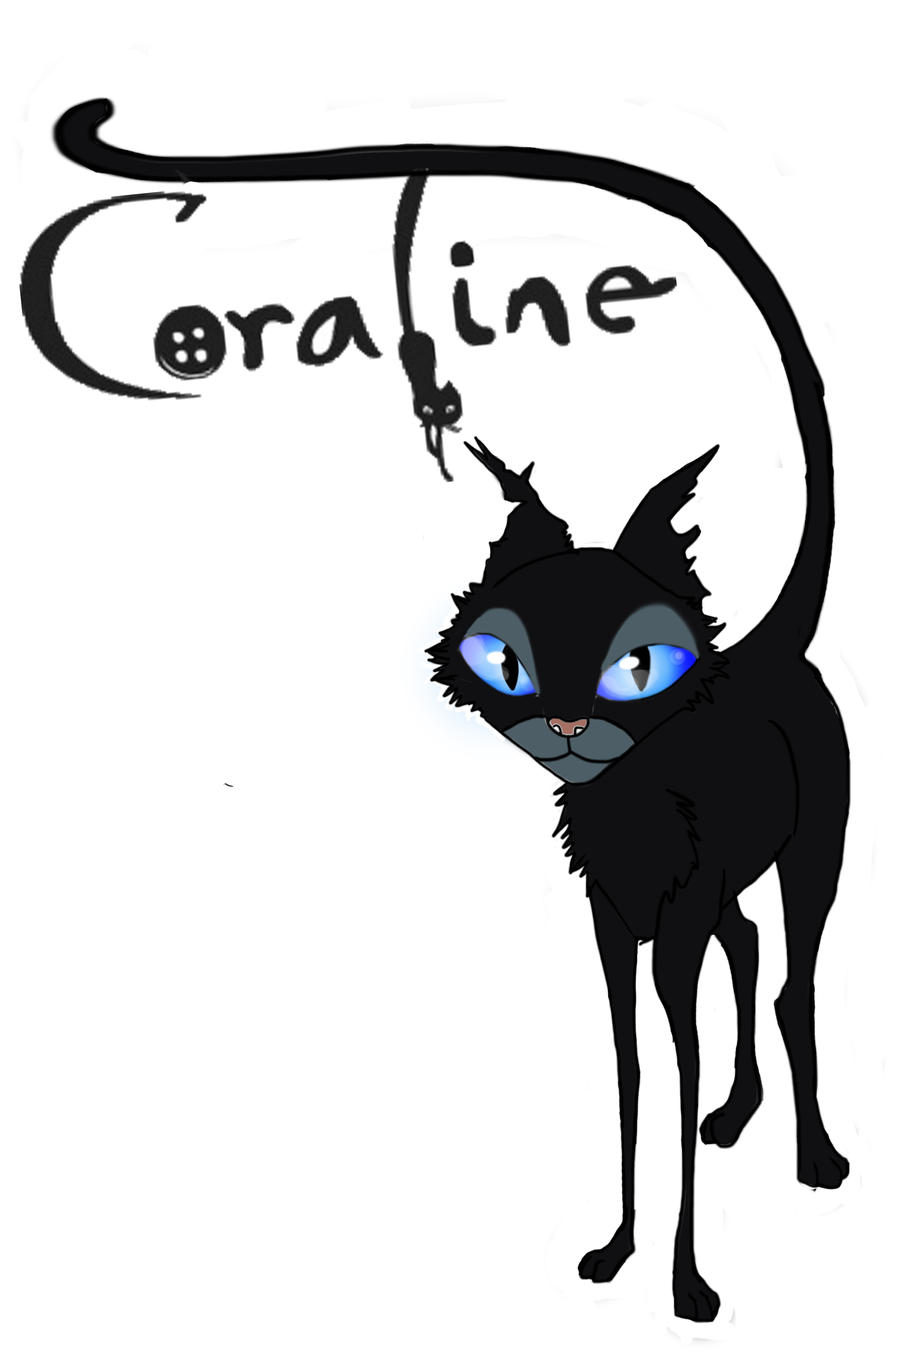 Coraline's cat by sensei95 on DeviantArt